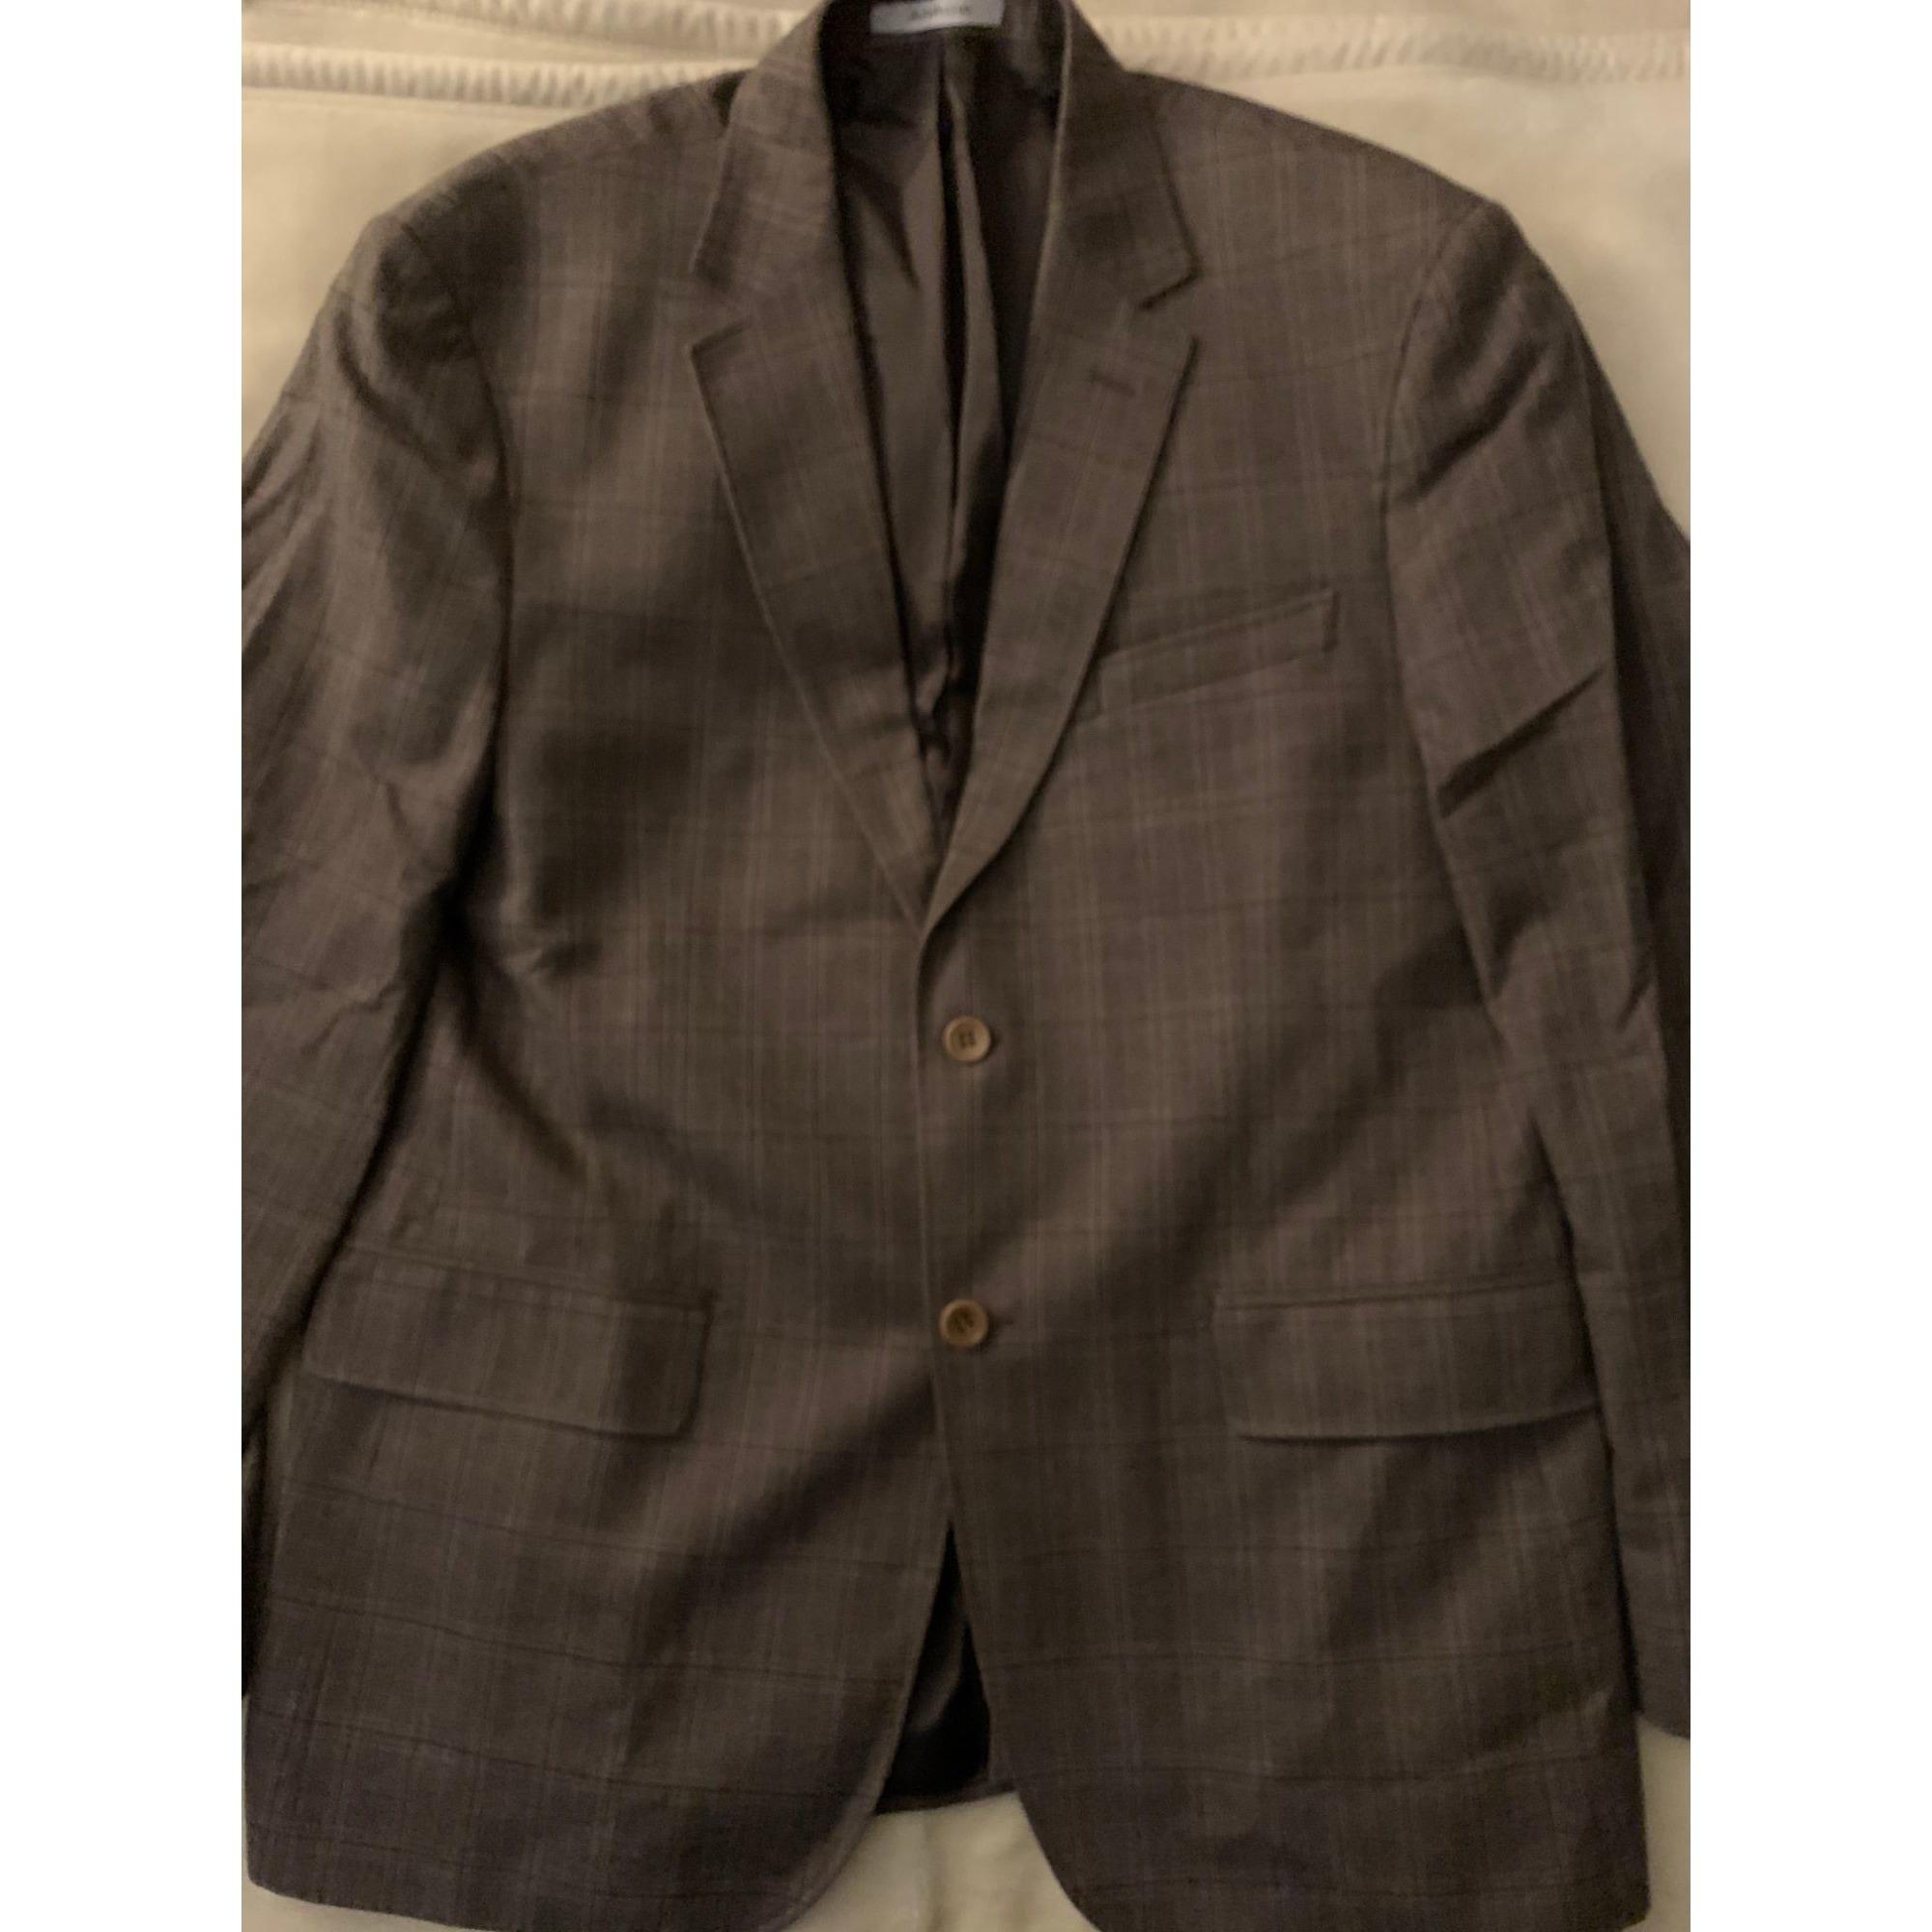 Veste de costume ARROW Doré, bronze, cuivre